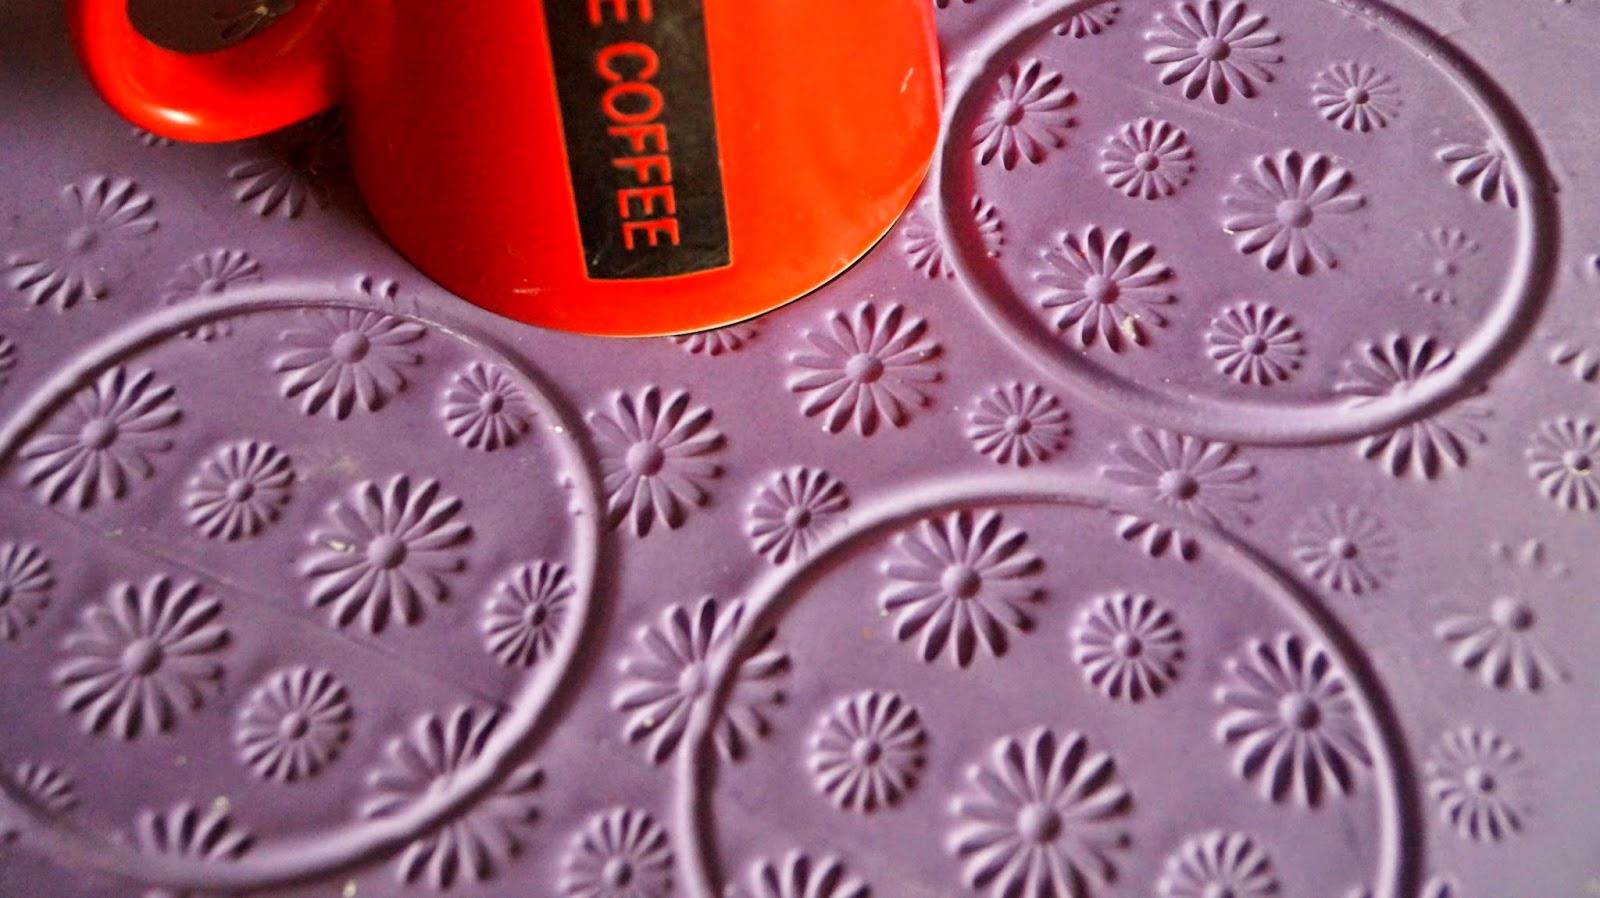 http://cupcakeluvs.blogspot.dk/2015/02/purple-inspiration-purple-dreams-cupcake.html